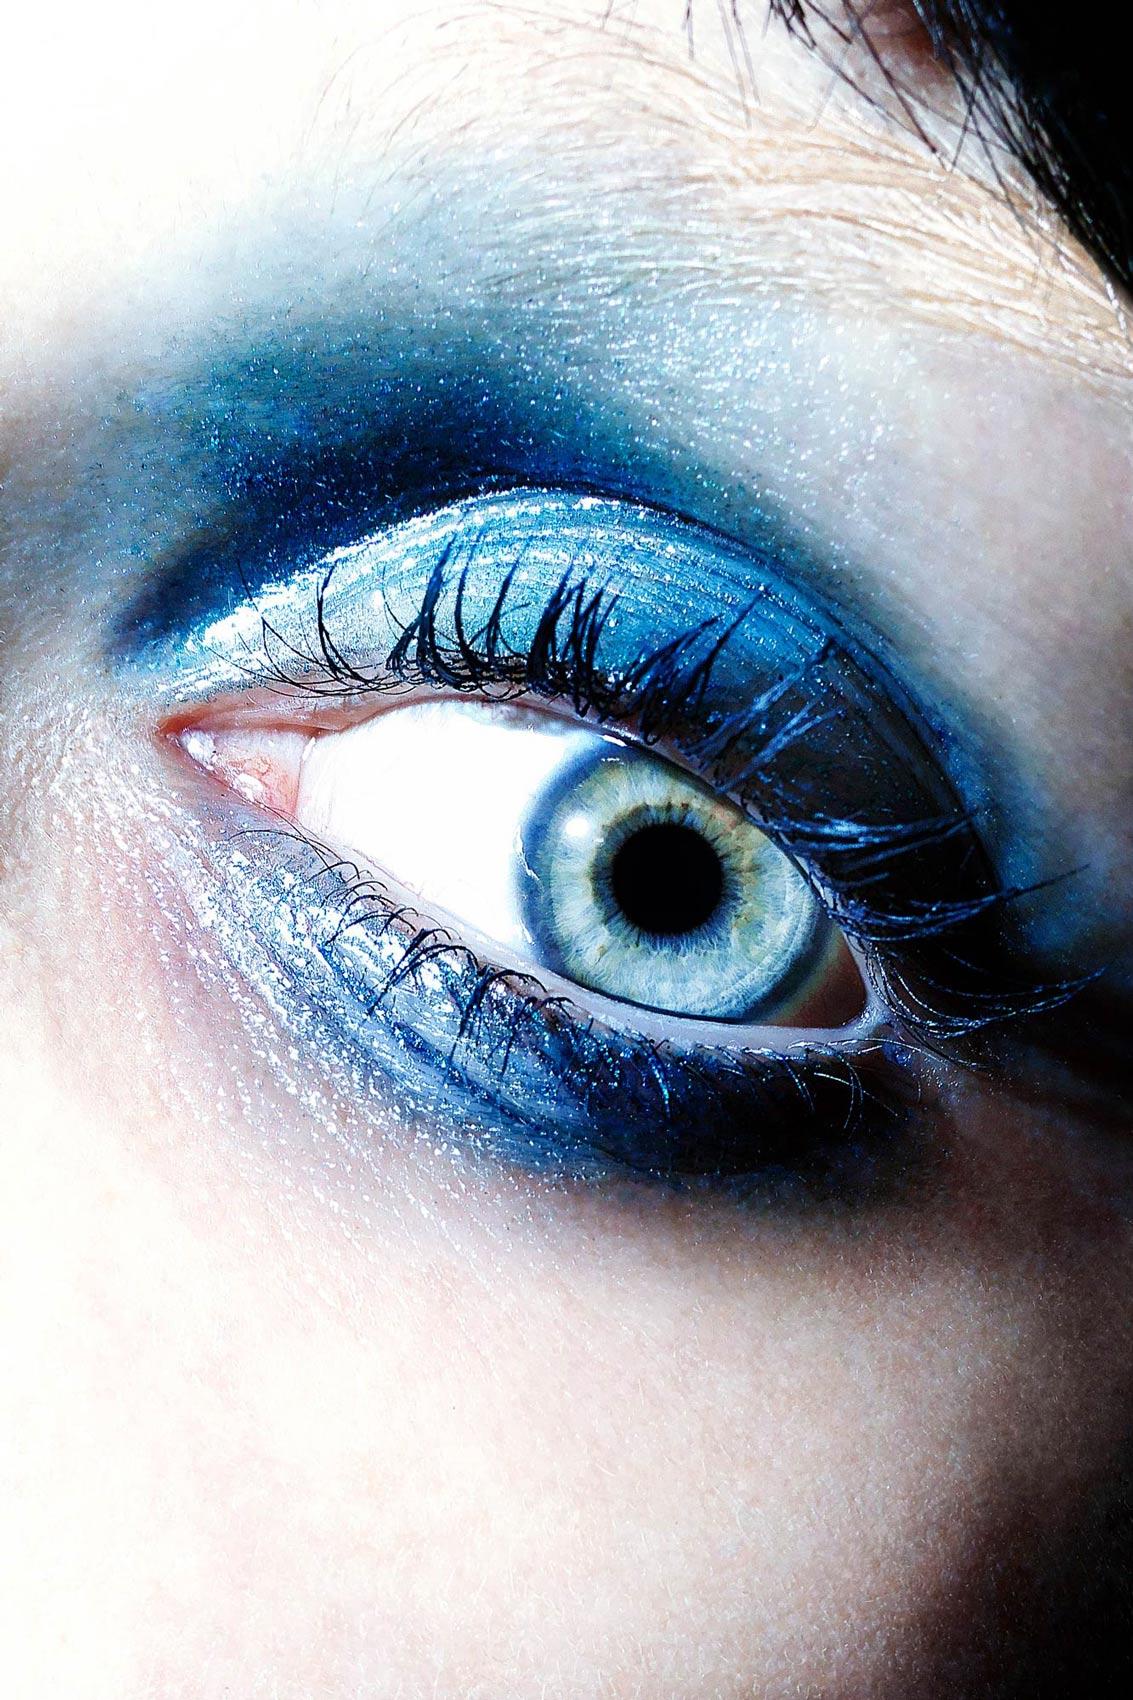 david_picchiottino_beauty_beaute_makeup_hair_06.jpg